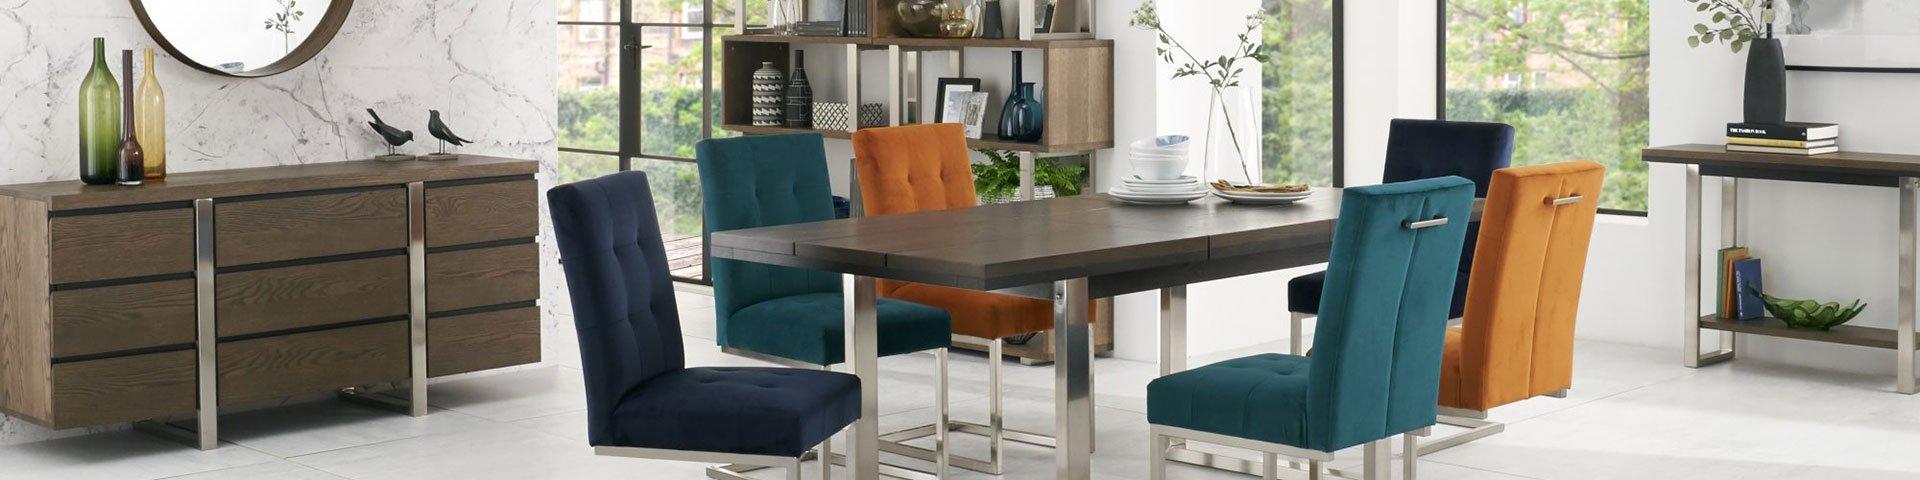 Dining Room Furniture at Abode Furniture